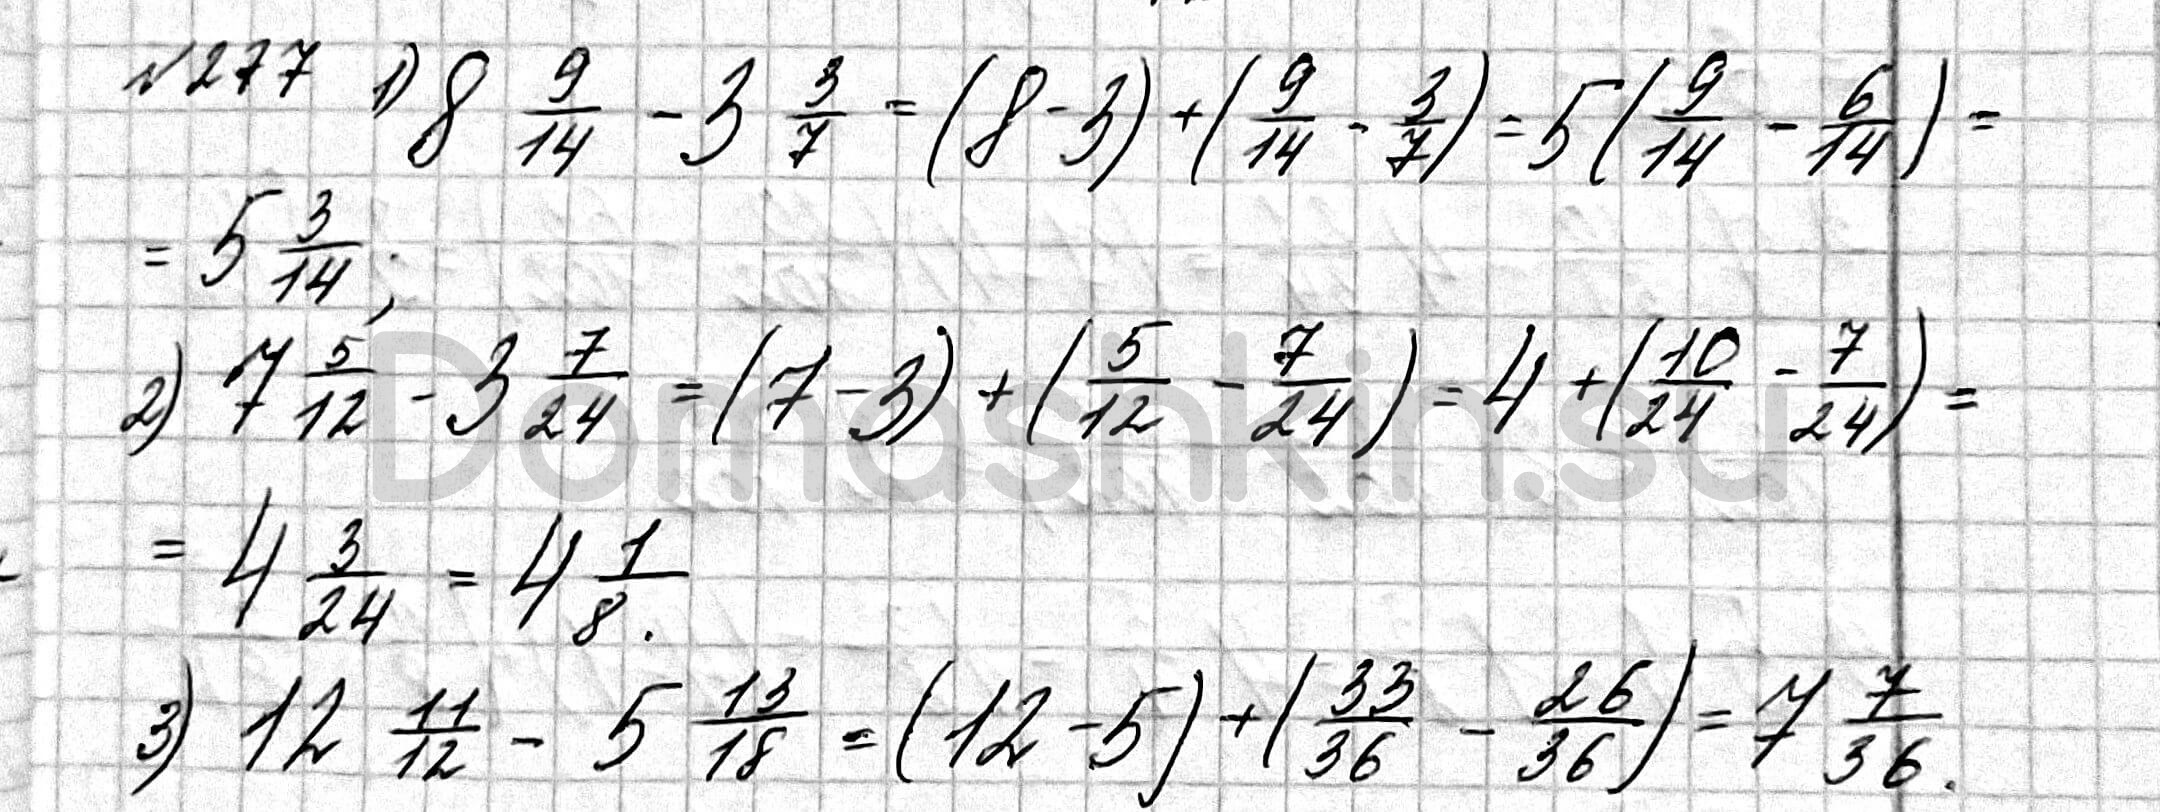 Математика 6 класс учебник Мерзляк номер 277 решение